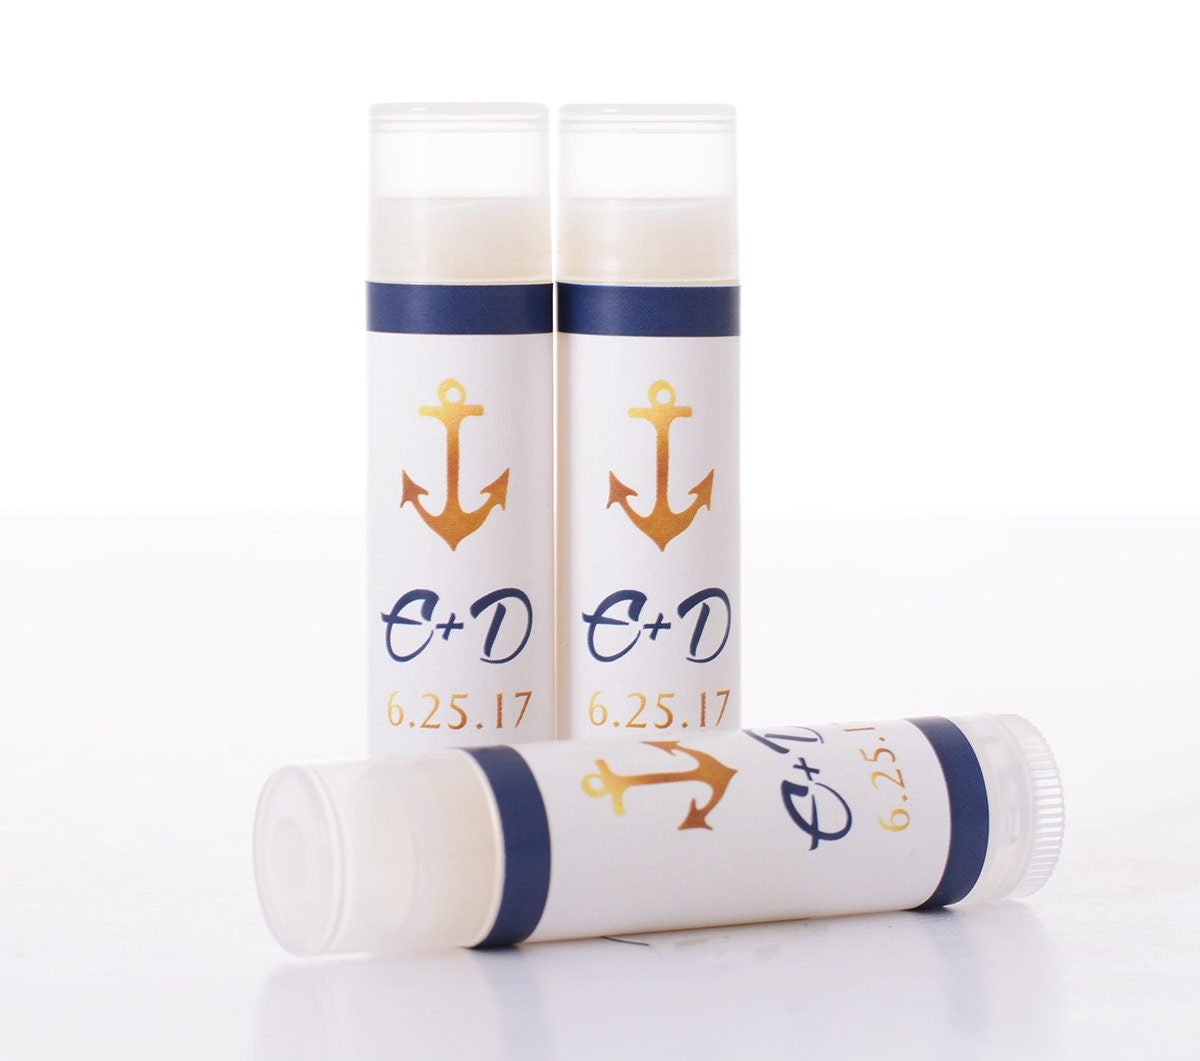 Nautical Wedding Favors 25 Lip Balm-Chapstick Stickers and